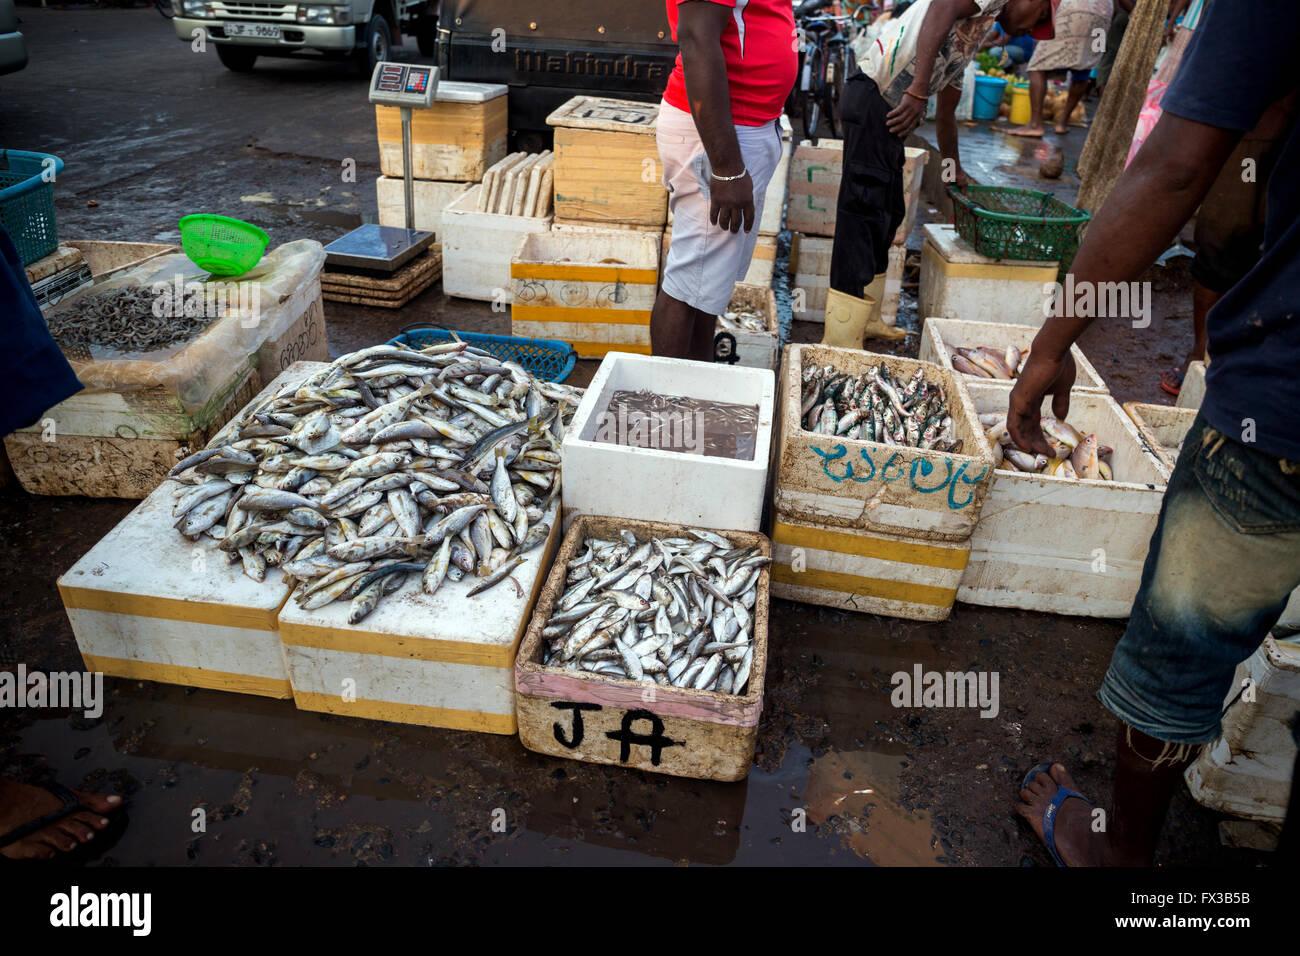 Fish for sale at Negombo fish market (Lellama fish market), Negombo, Sri Lanka, Asia Stock Photo